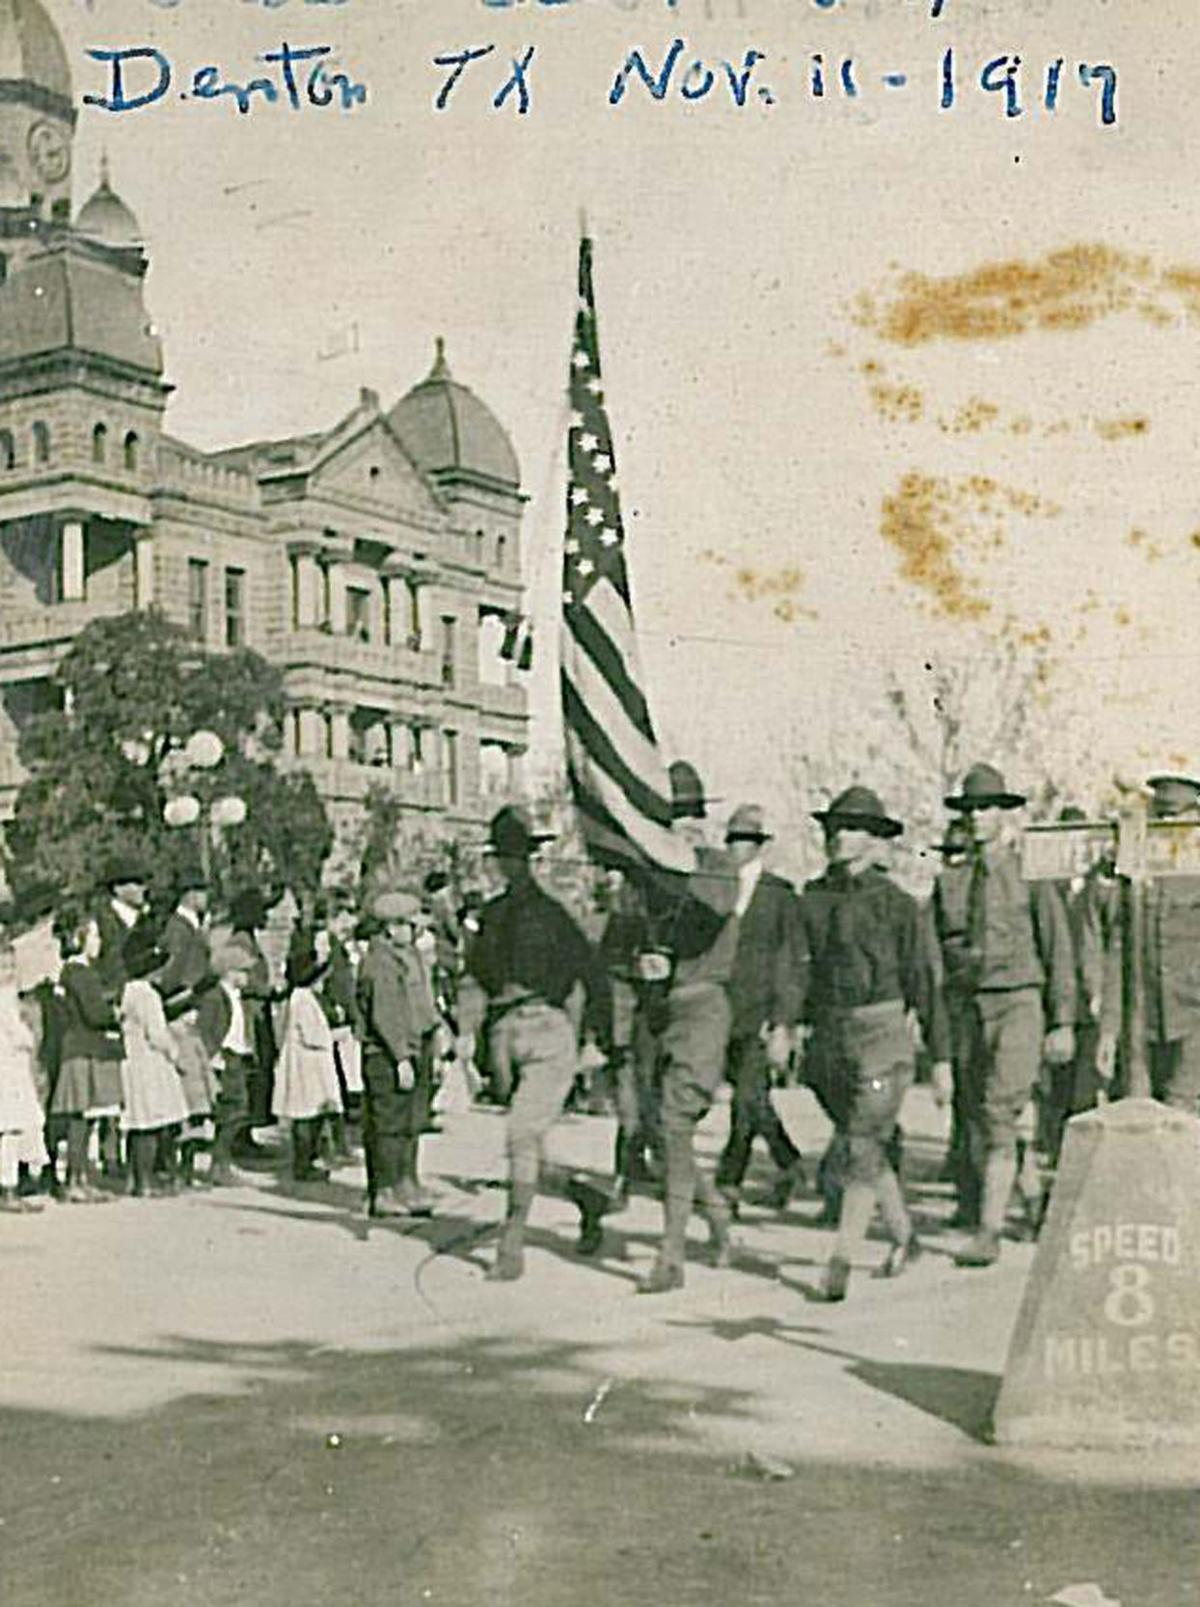 1917 Denton street sign during Armistice Parade